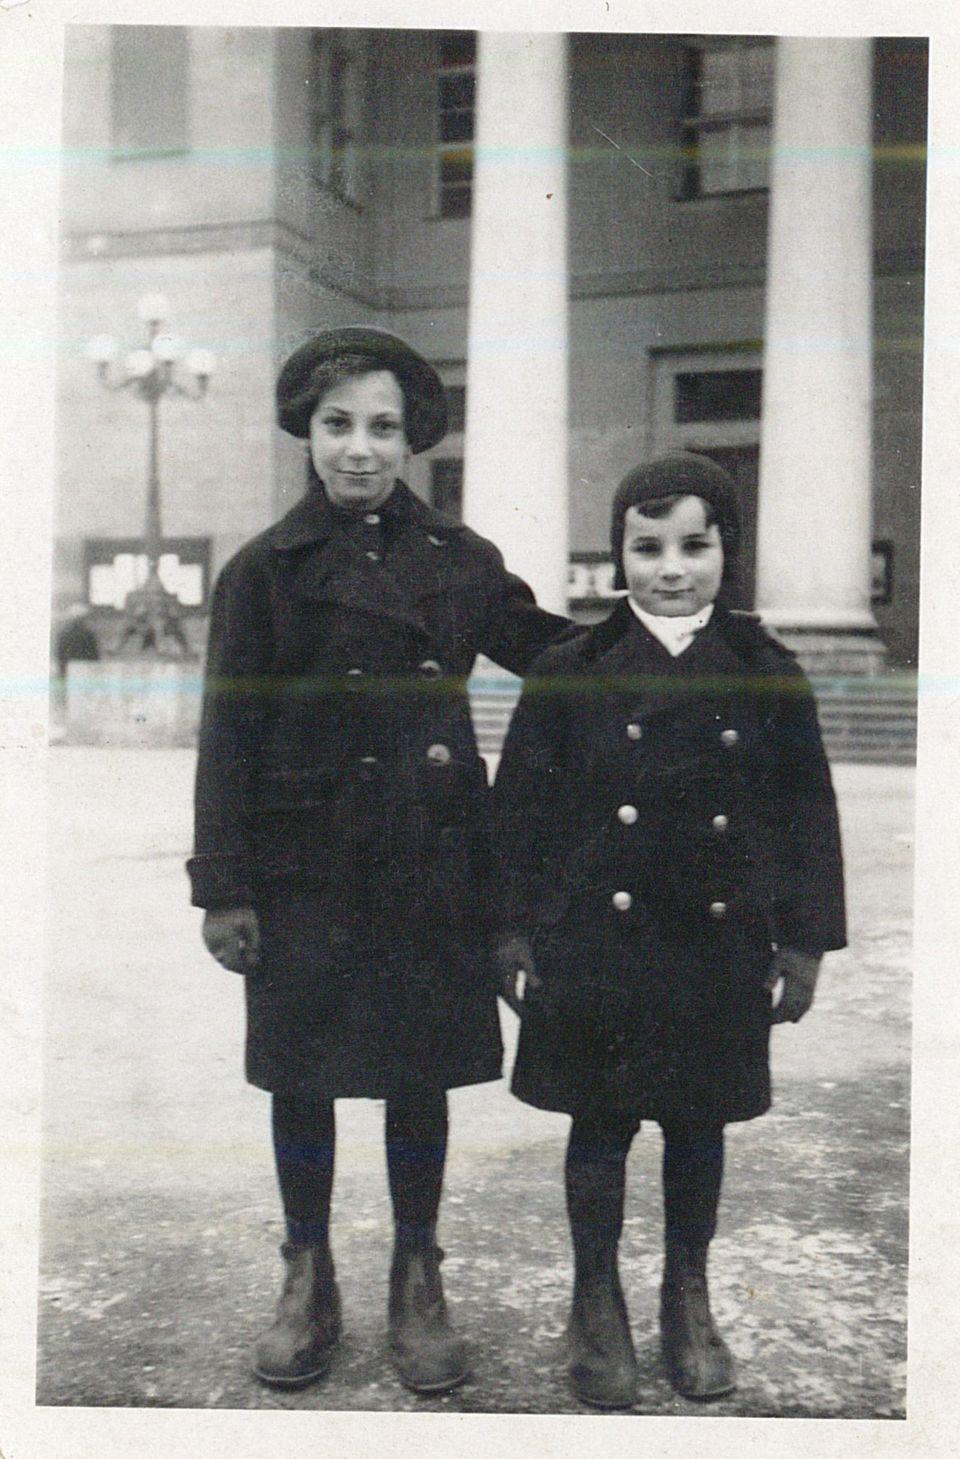 Harry and Ruth Heber left Vienna on theKindertransport on 18 December